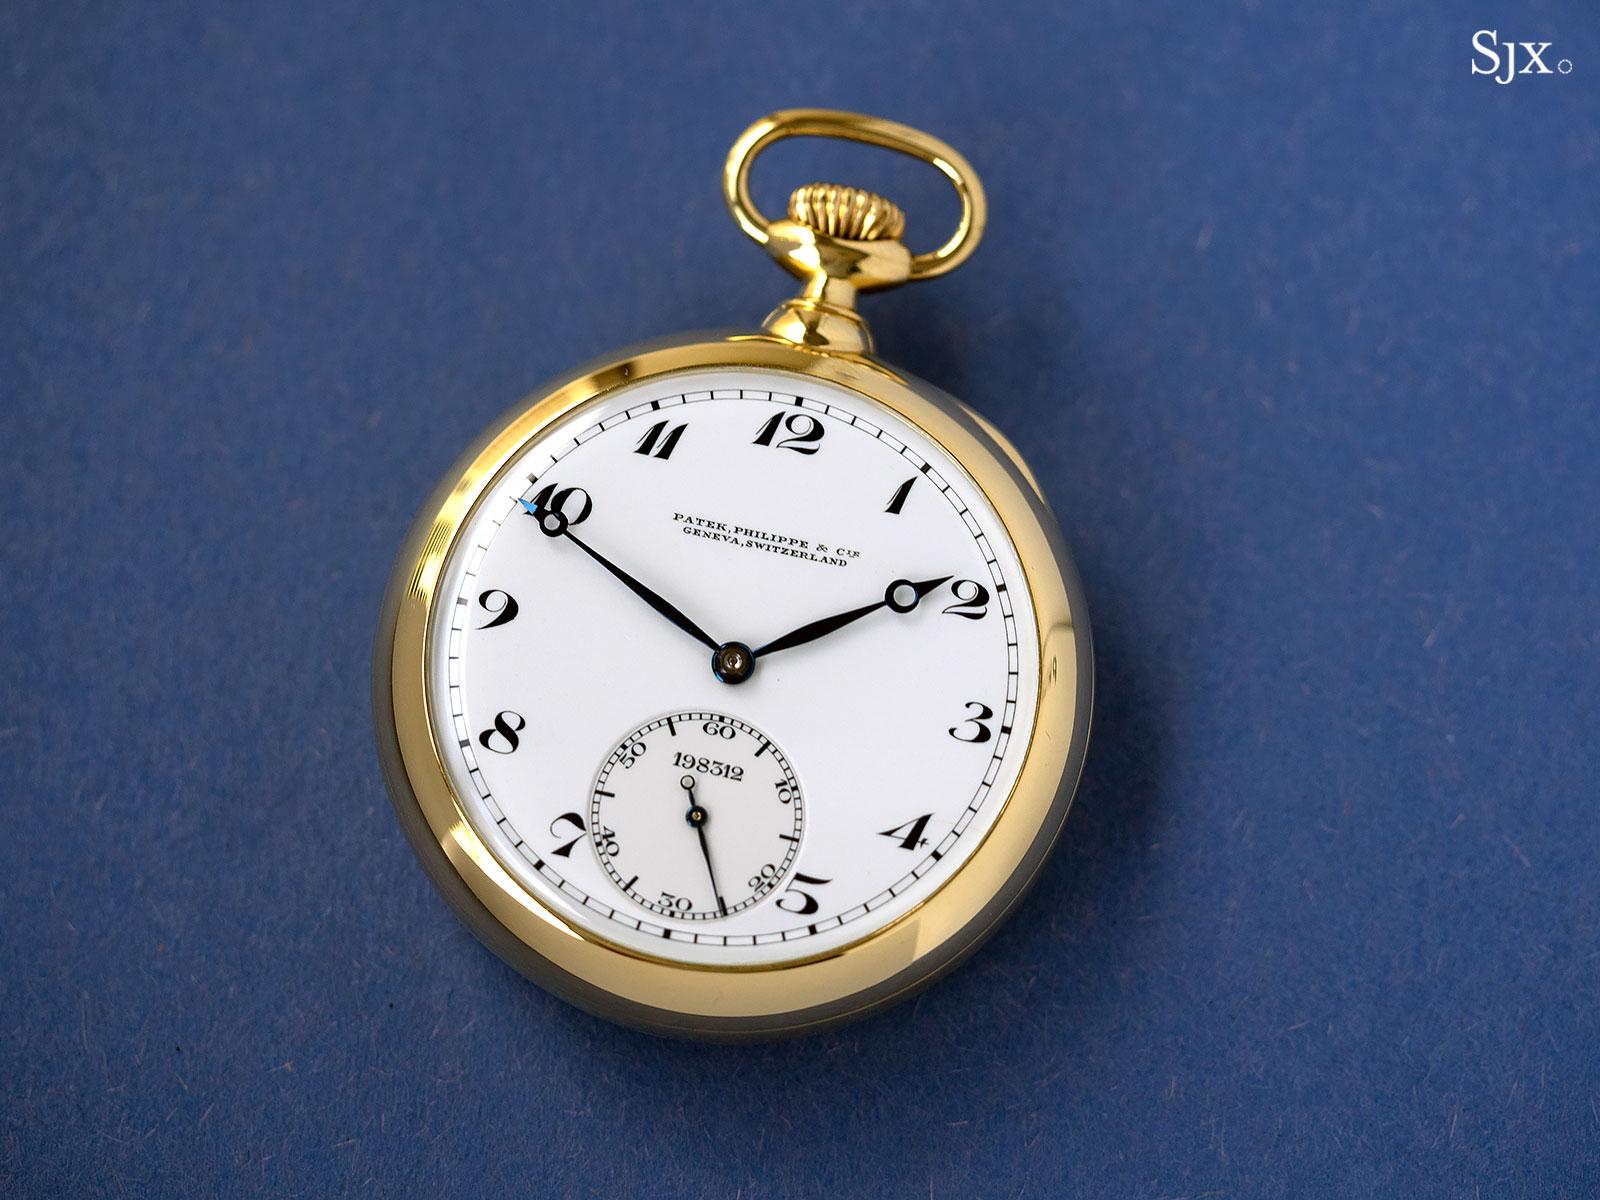 Up Close: Patek Philippe Observatory Tourbillon Pocket Watch No. 198'312 | SJX Watches